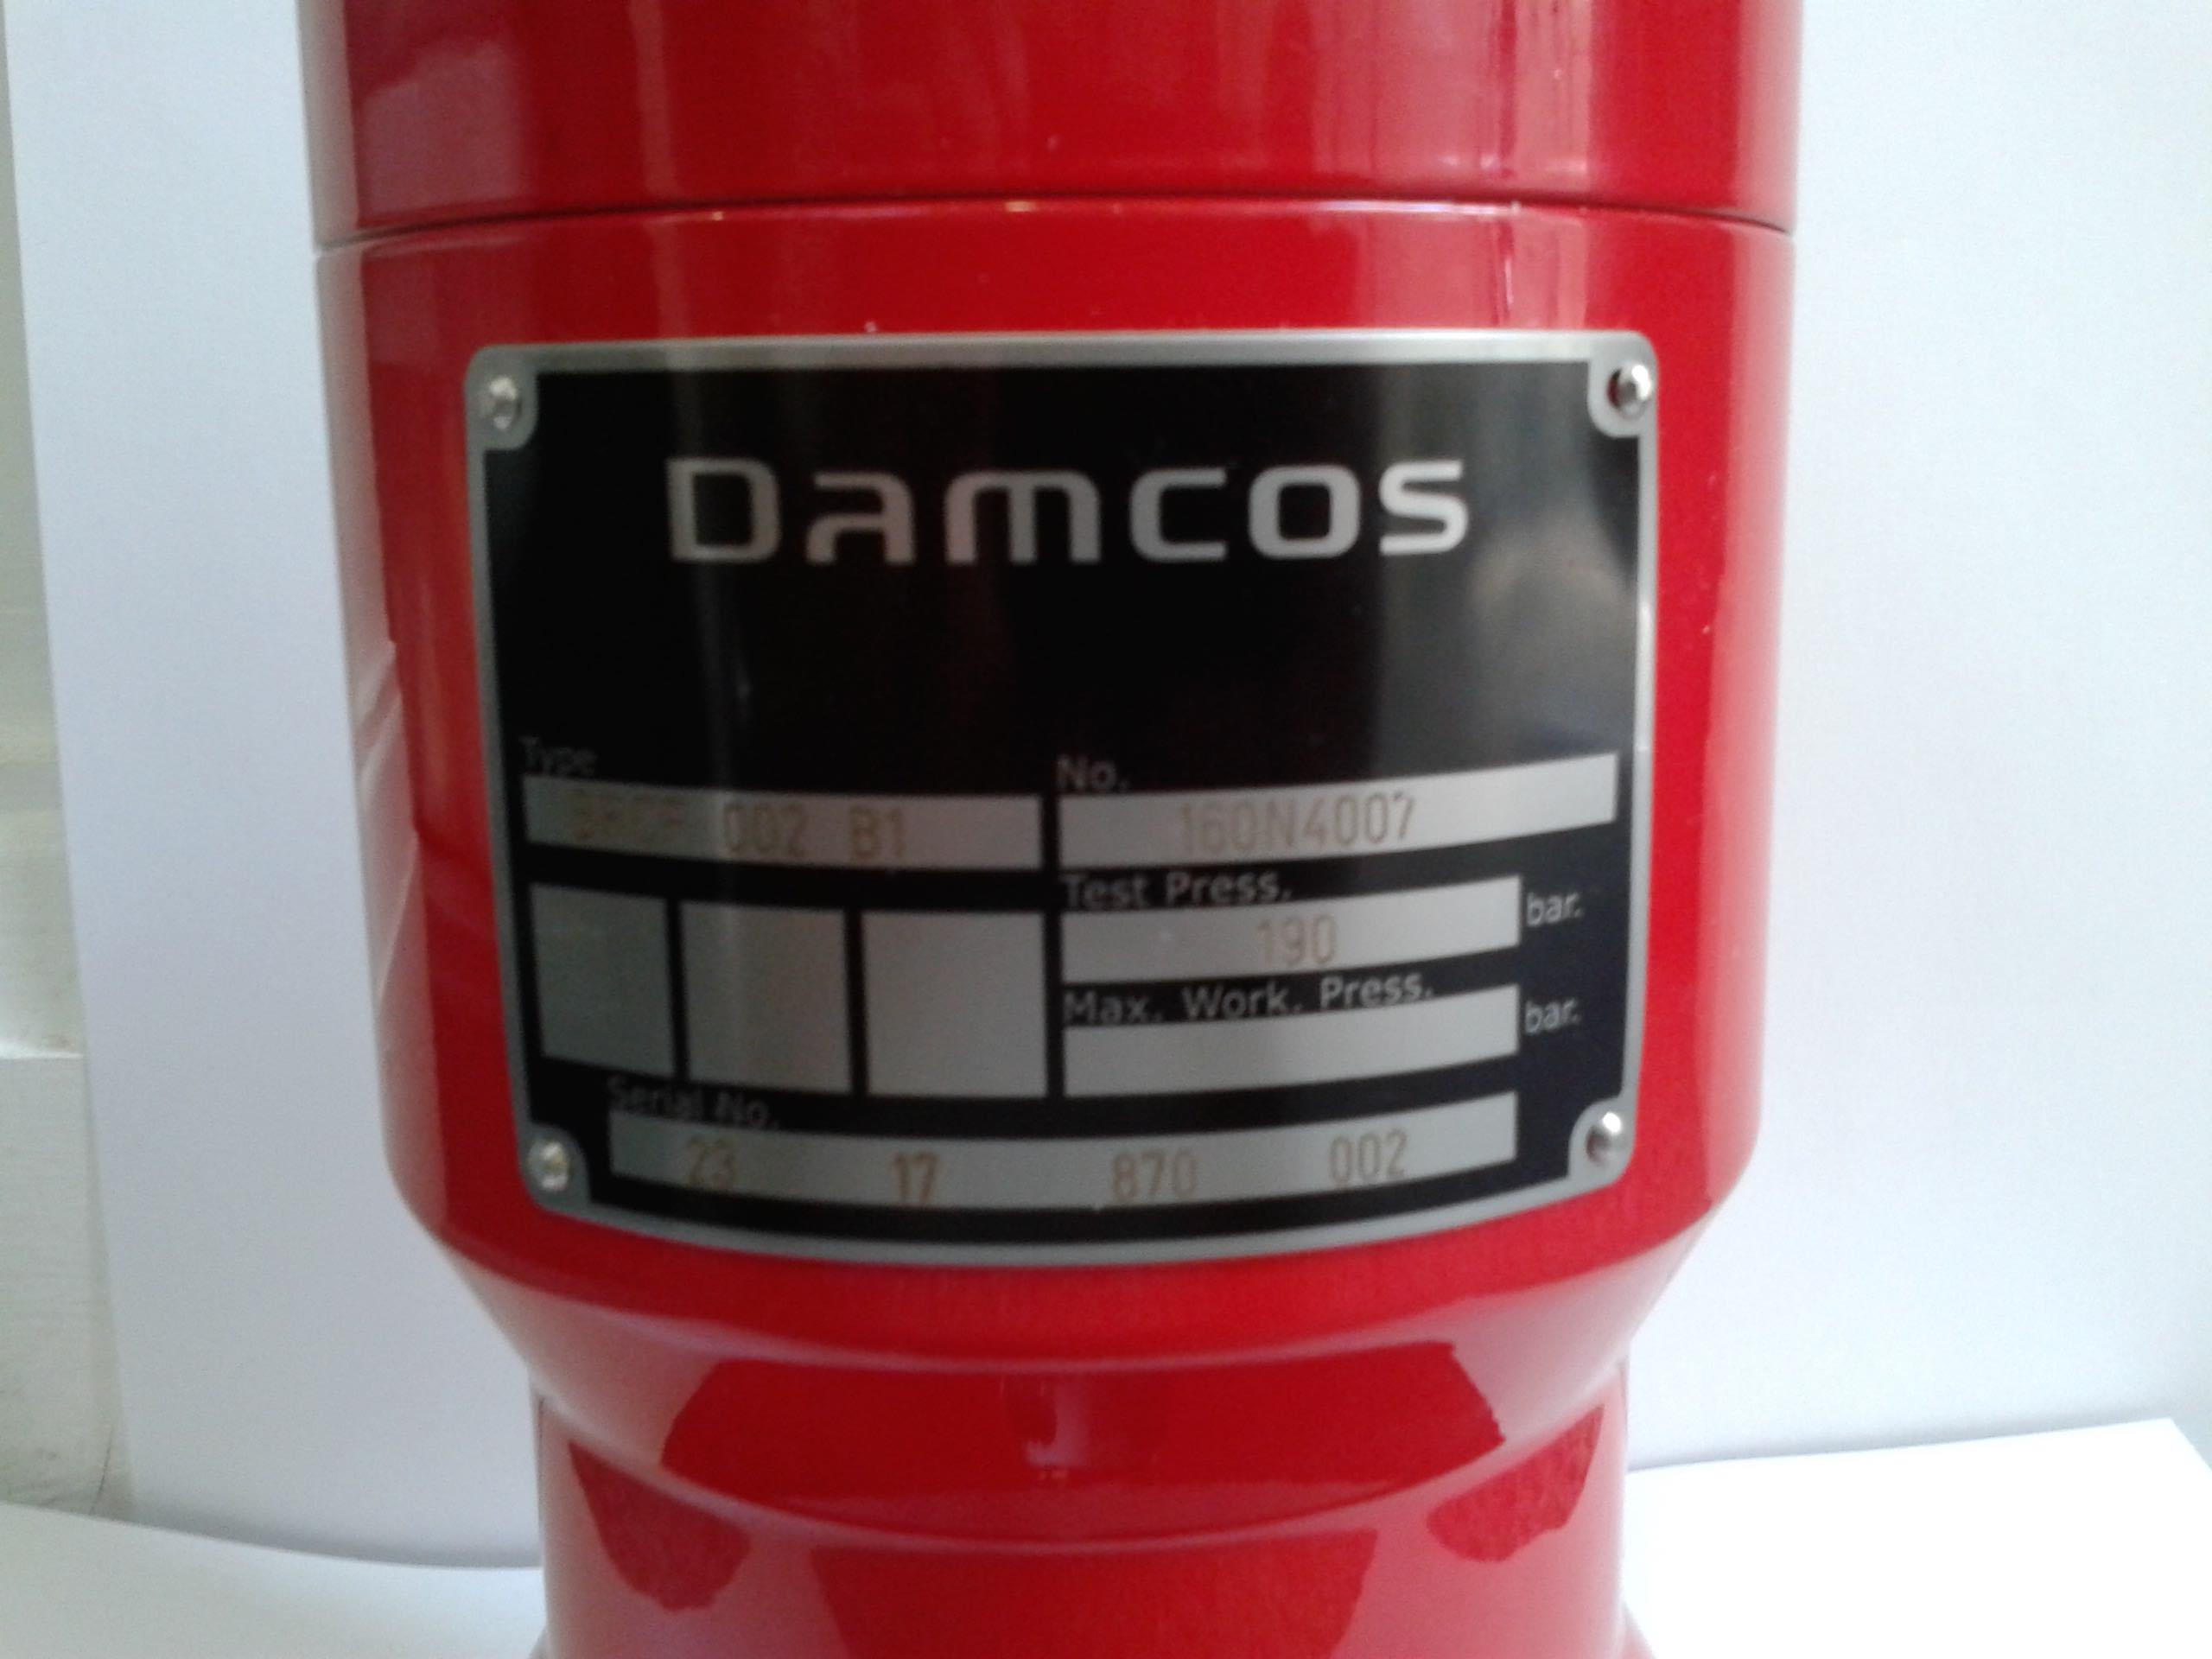 Damcos Danfoss BRCF-002-B1 160N4007